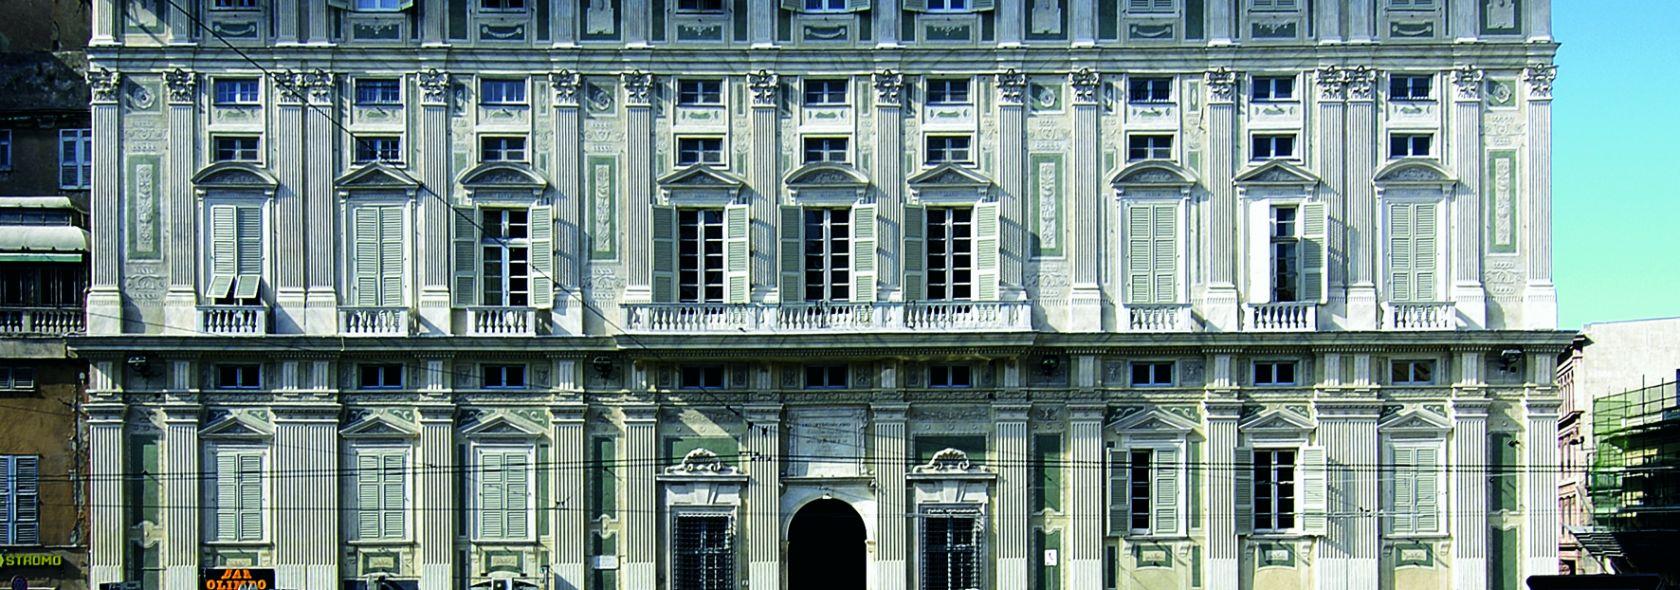 Palazzo Antoniotto Cattaneo (Palazzo Belimbau)